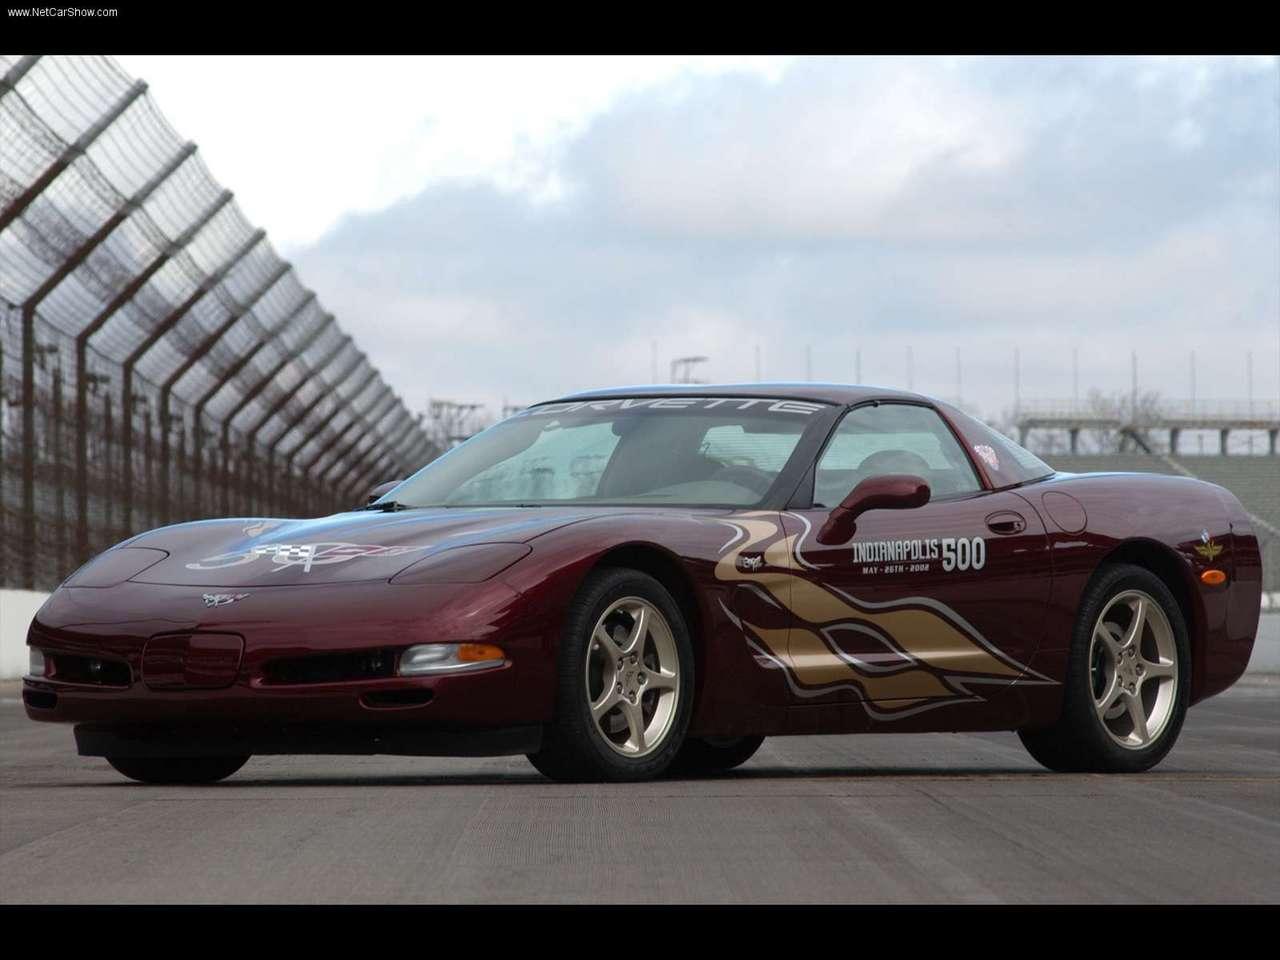 http://2.bp.blogspot.com/-eUvuODIFvWY/TYgyEz-gZoI/AAAAAAAAN_w/cTS1p_iFQdU/s1600/Chevrolet-Corvette_Indy_500_Pace_Car_2002_1280x960_wallpaper_04.jpg